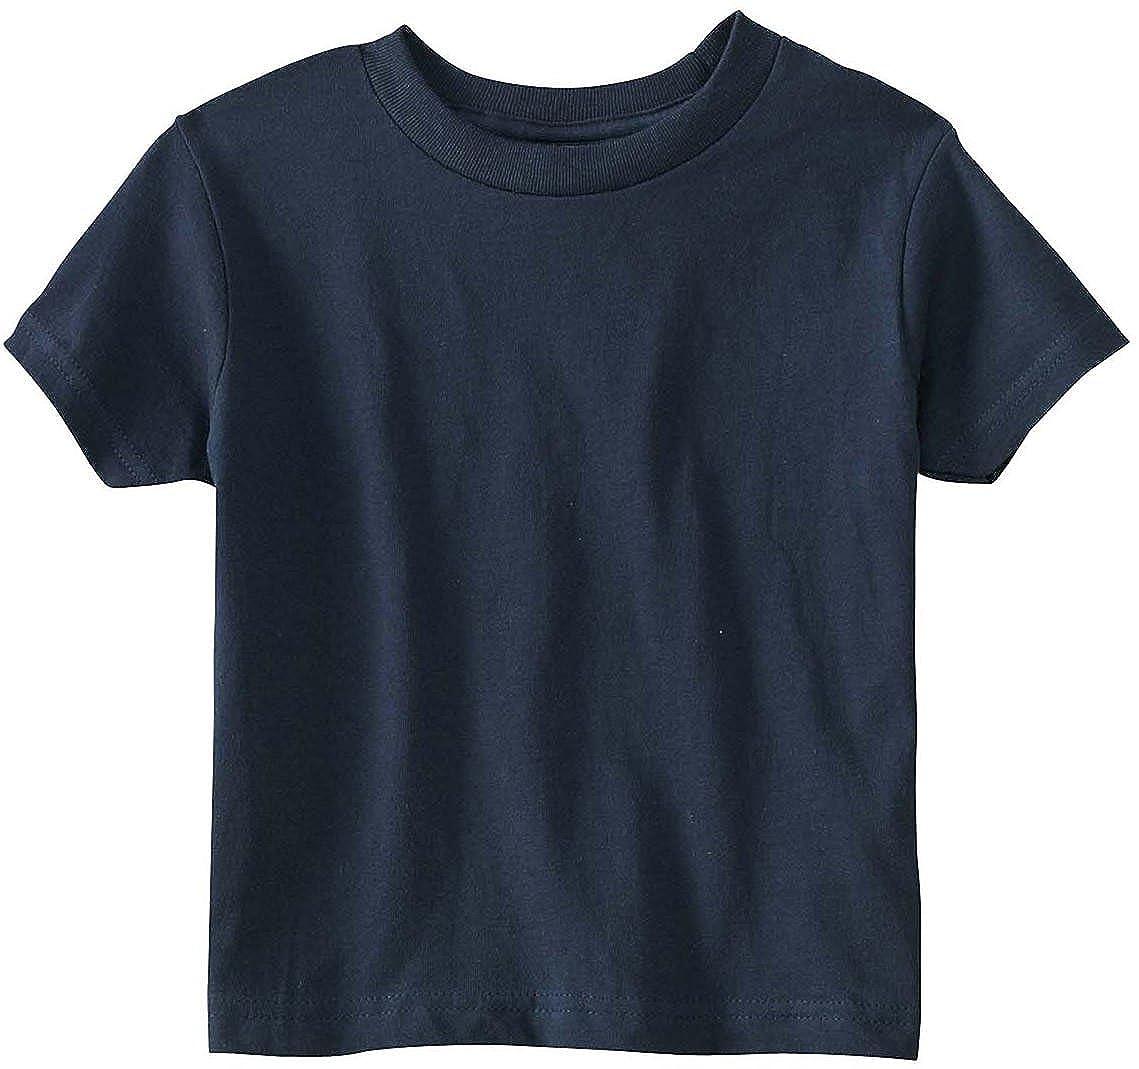 929def760 Amazon.com: RS3301 Rabbit Skins Toddler's 5.5 oz. Jersey Short-Sleeve T- Shirt: Clothing